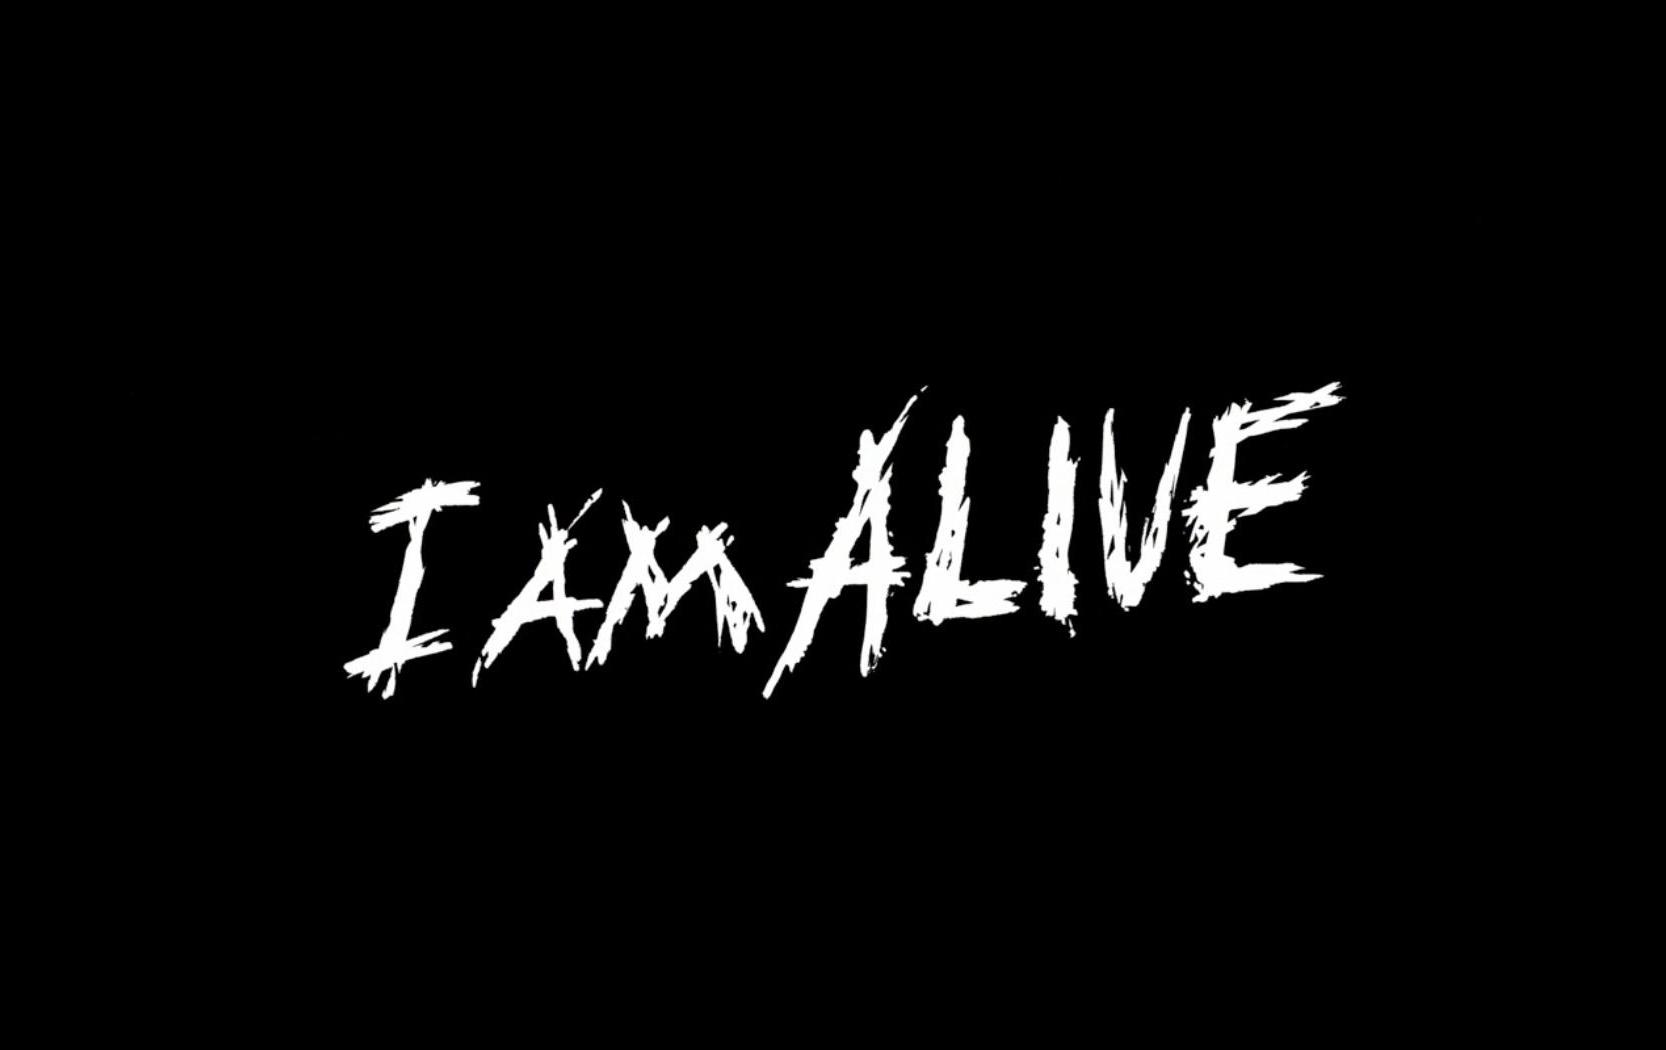 Am Alive Logo Wallpaper 5011 Wallpaper Cool Walldiskpapercom 1666x1050